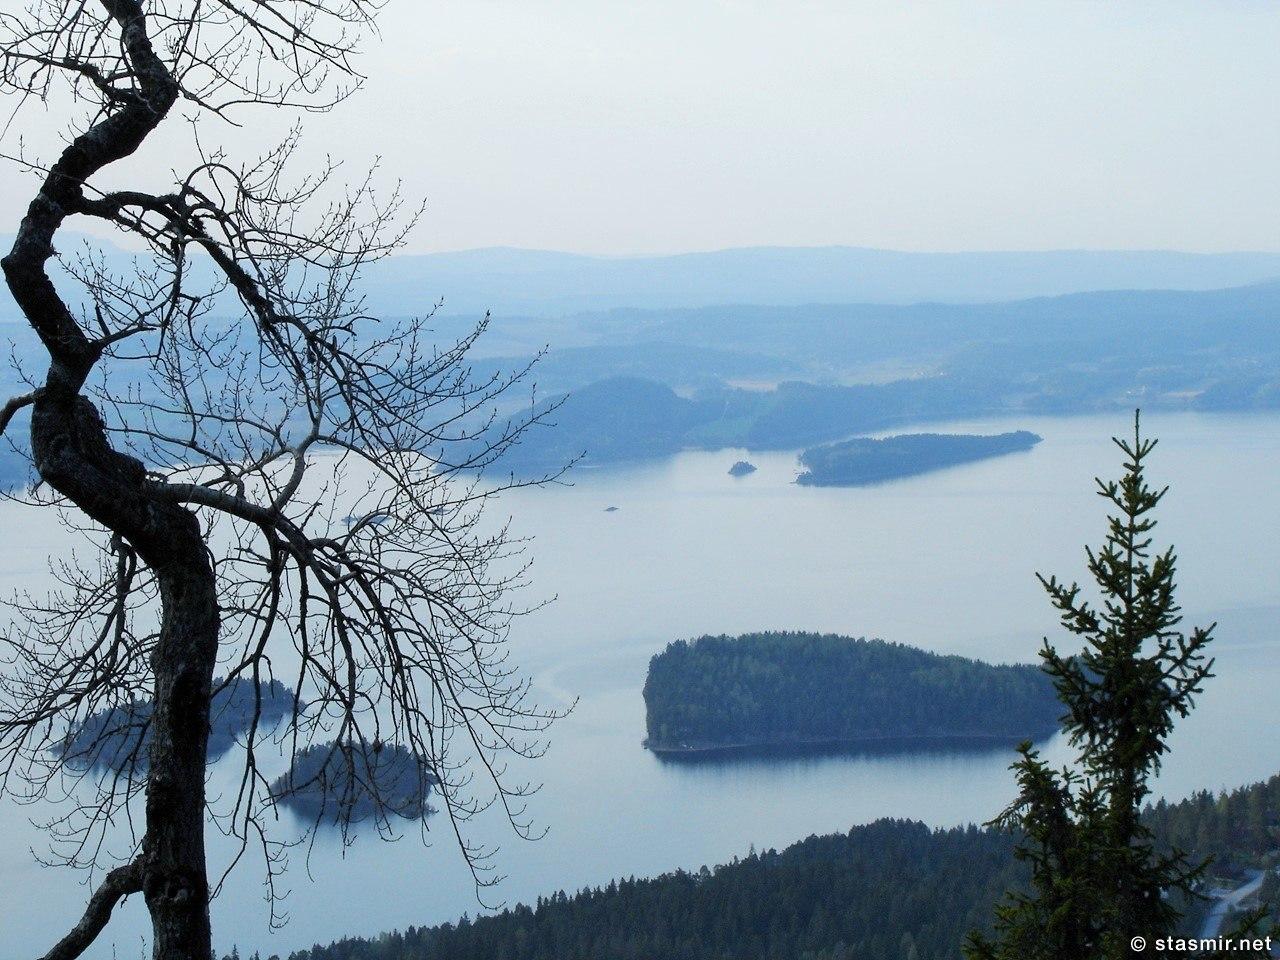 Tyrifjorden, Норвегия, фото Стасмир, Photo Stasmir